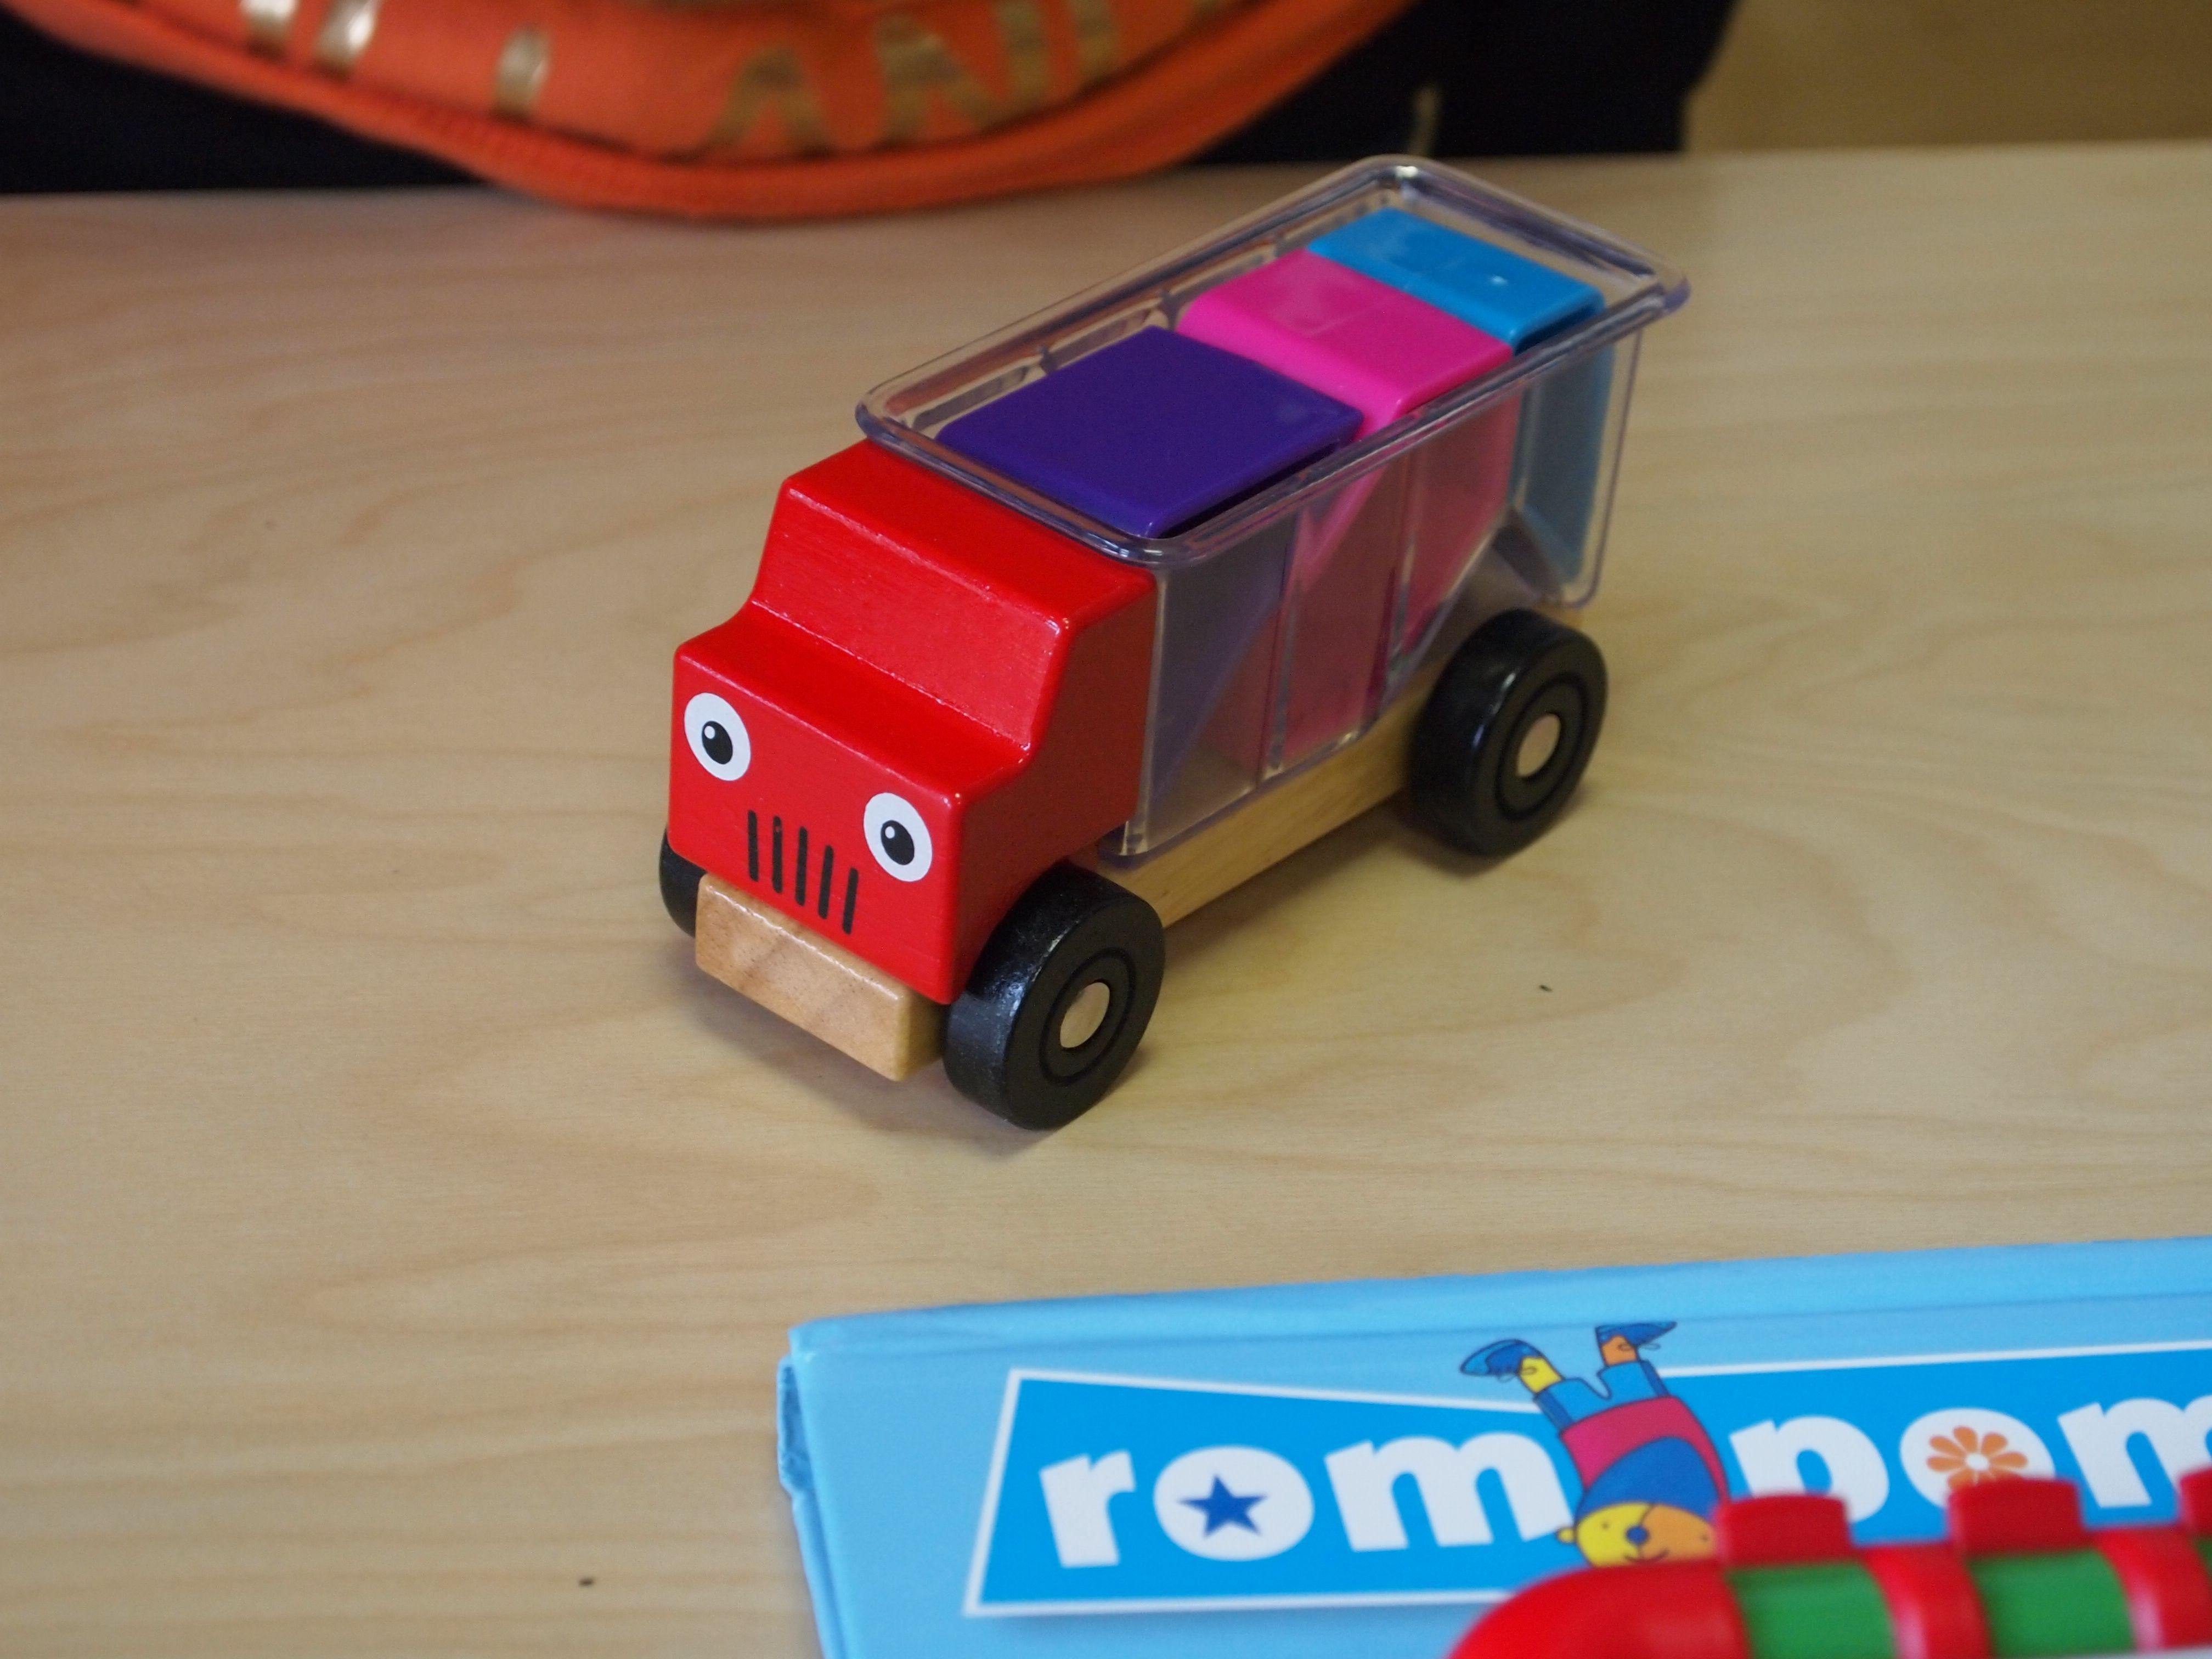 Uitdaging Trucky 3 Ertoys Speelgoed